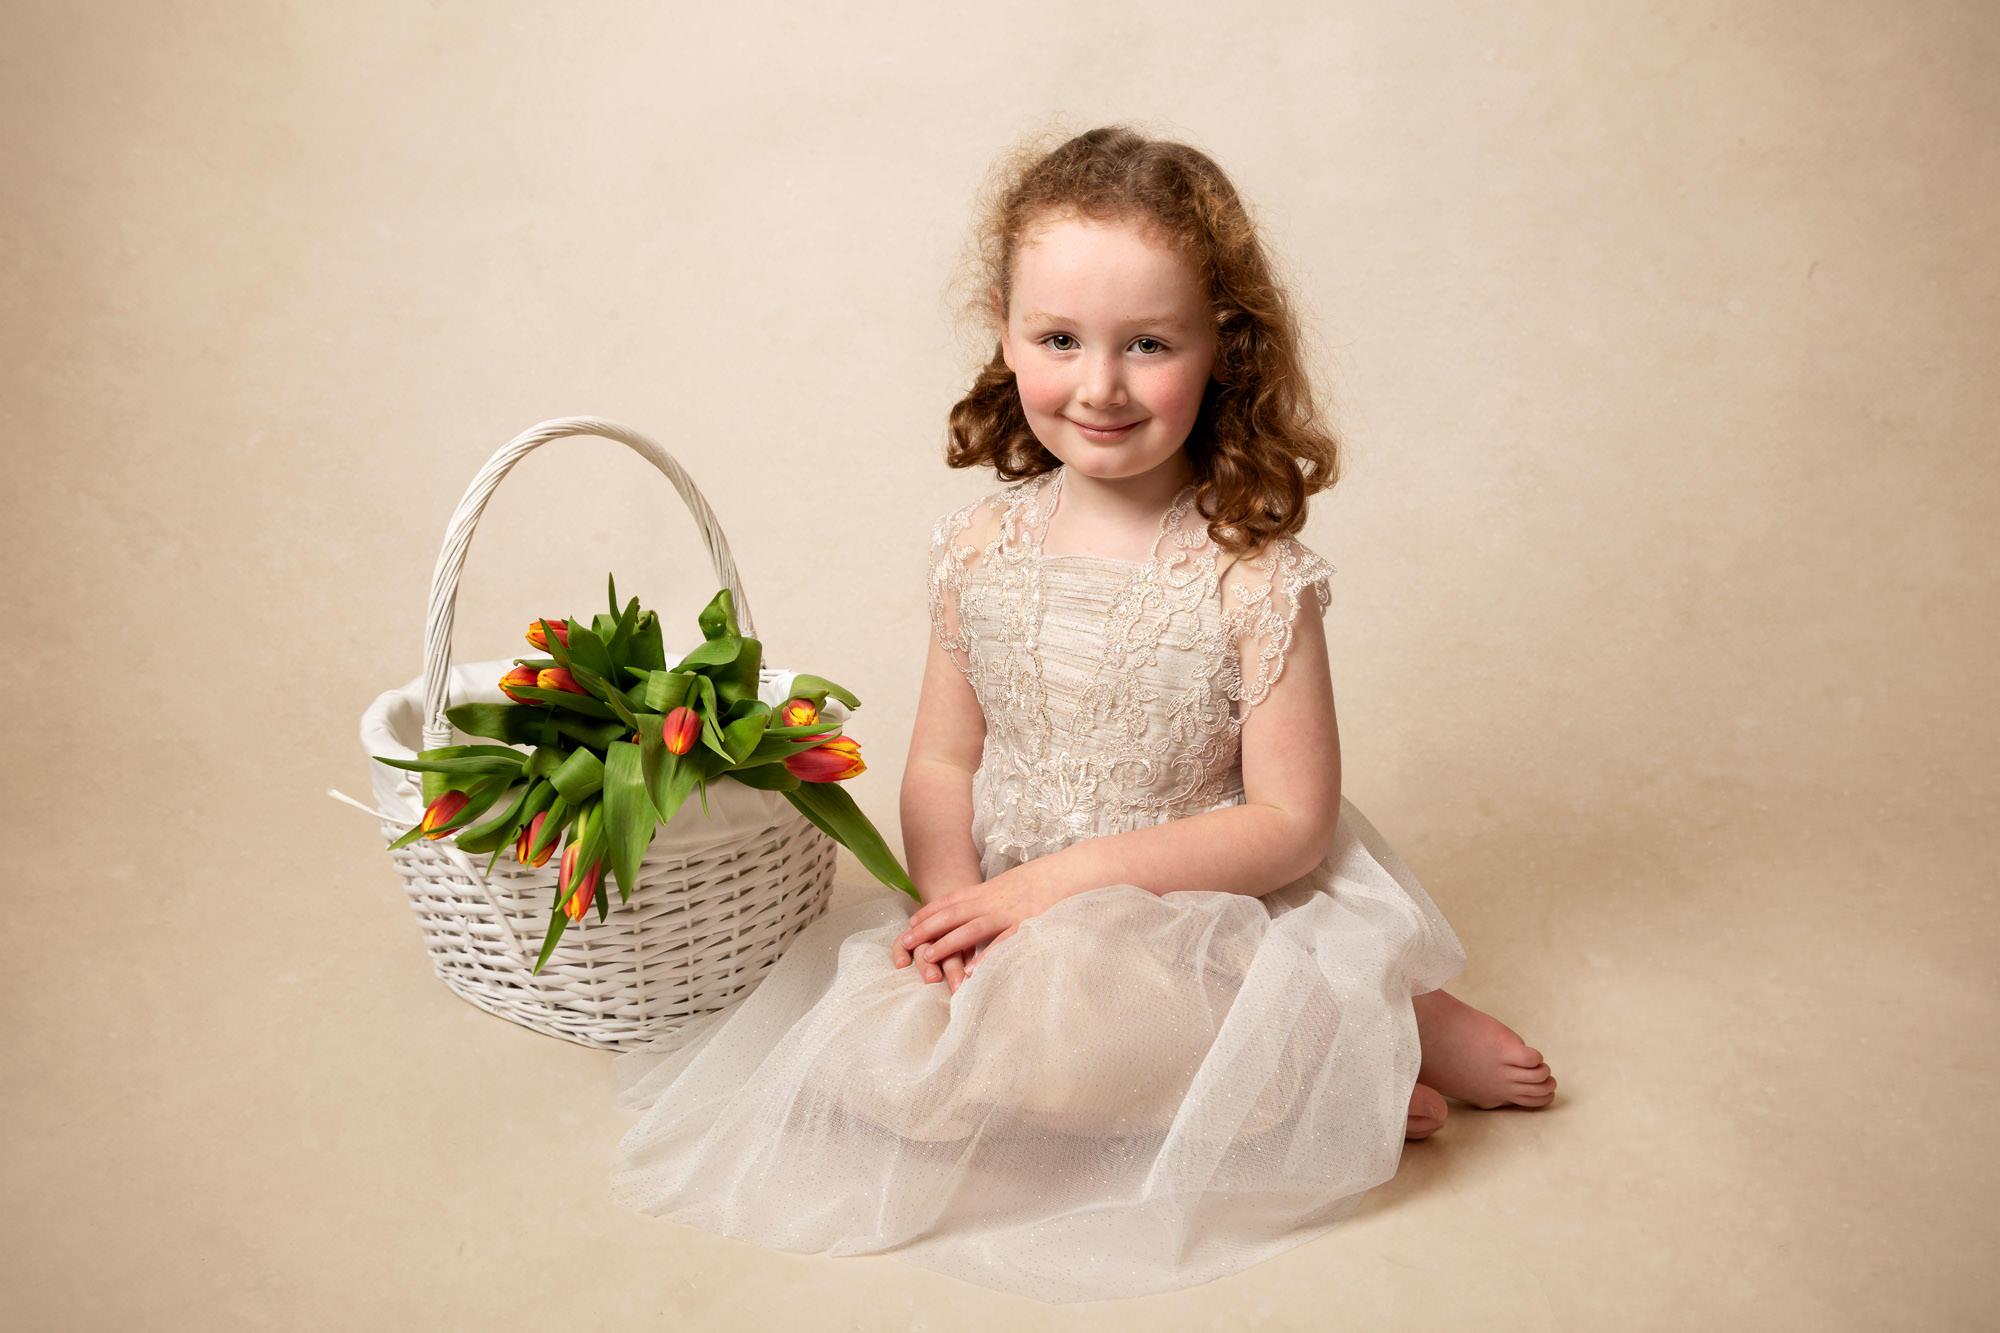 Children's Photo Shoots Yorkshire